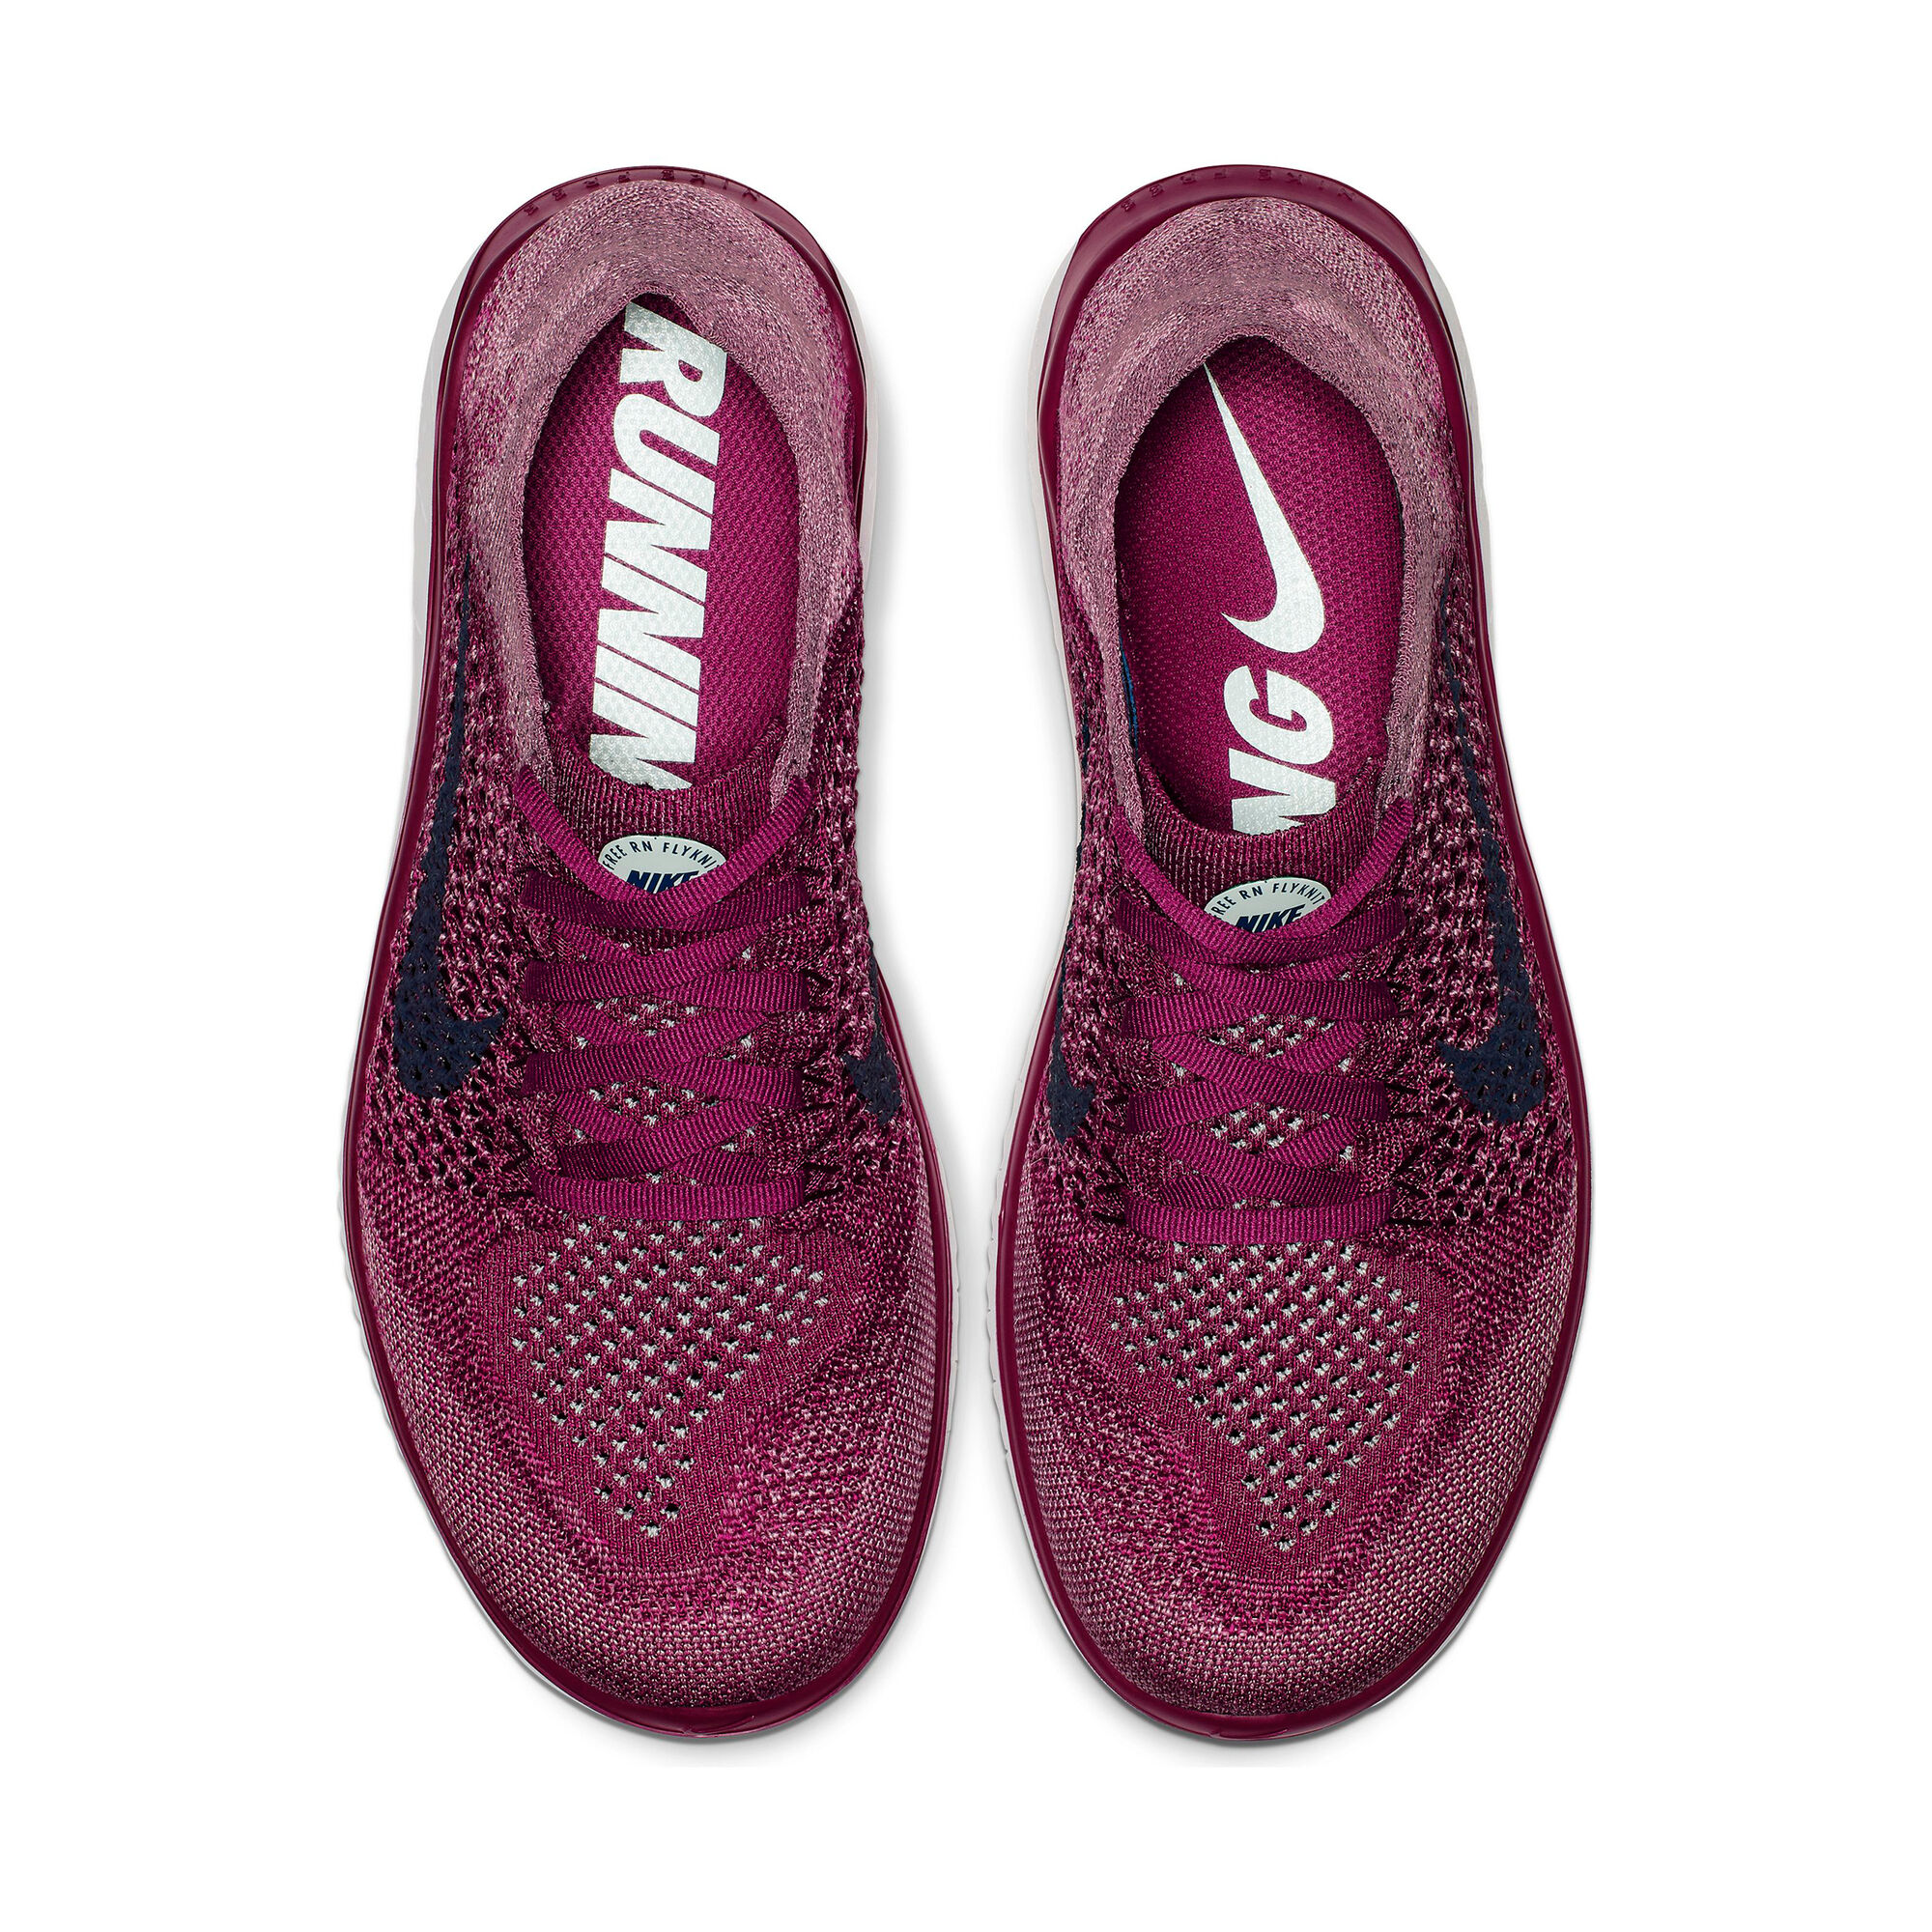 06543aaeea43f Nike  Nike  Nike  Nike  Nike  Nike  Nike  Nike  Nike. Free Run Flyknit 2018  ...